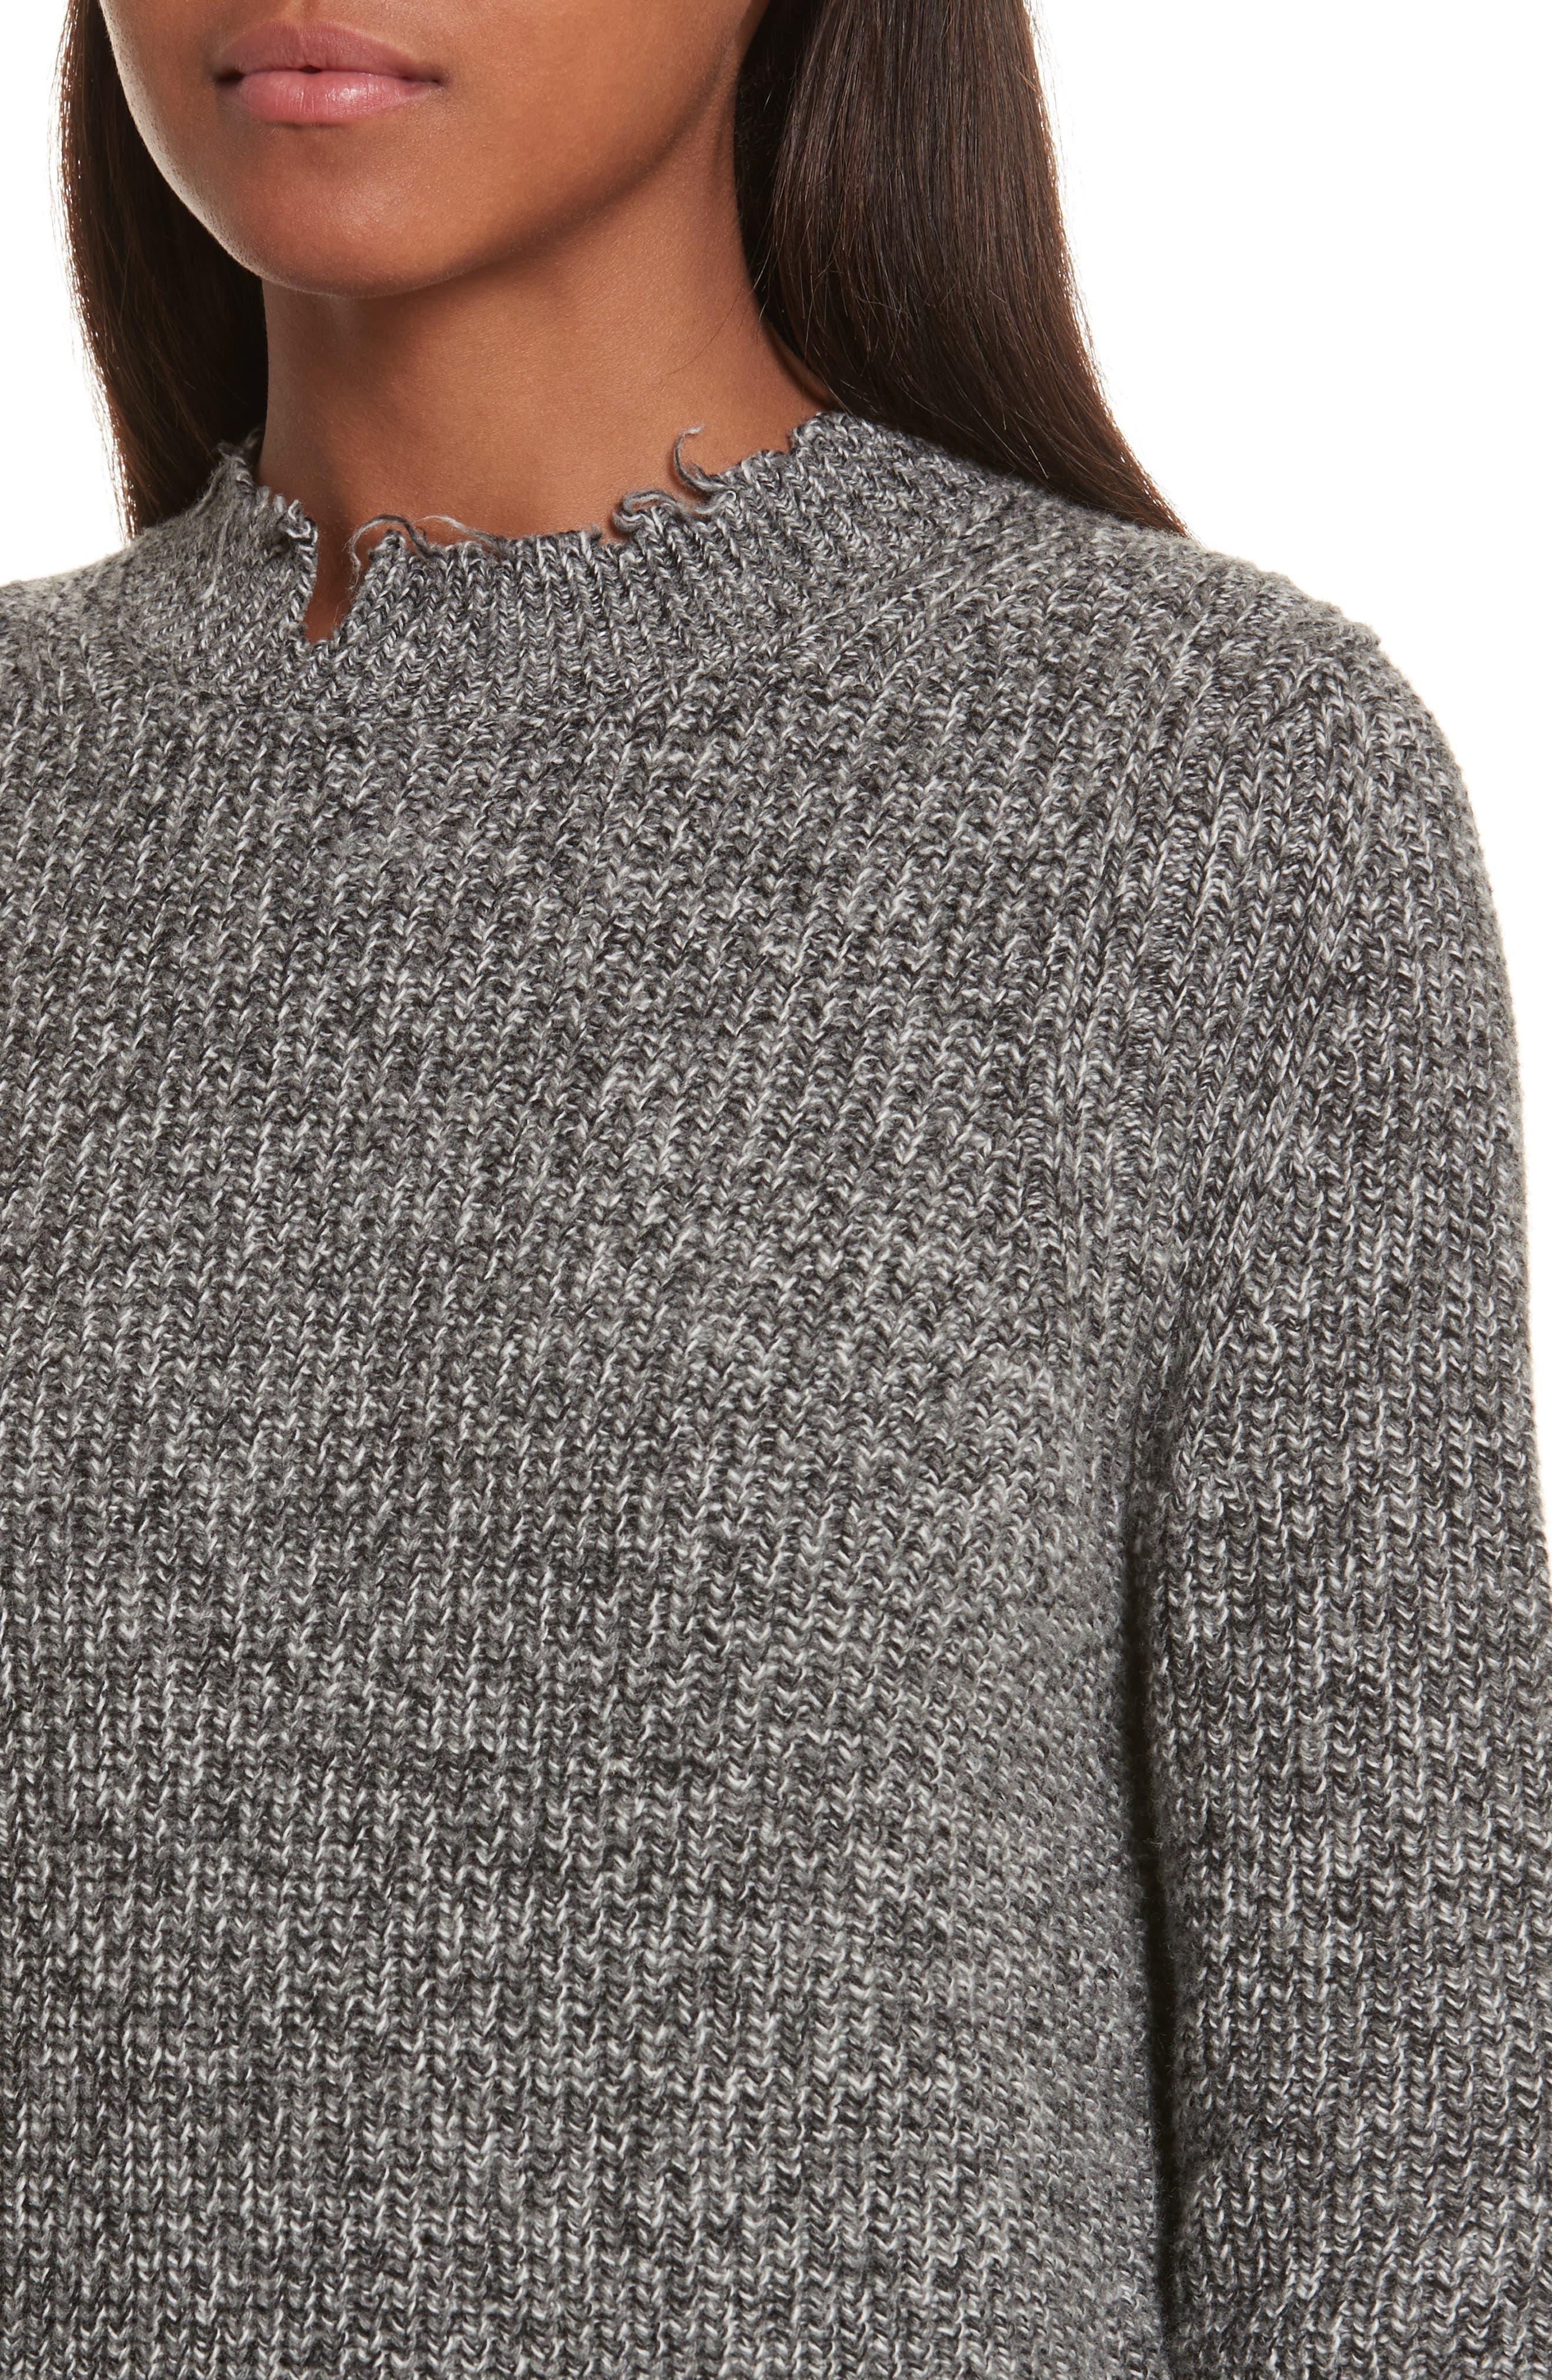 Grunge Marl Sweater,                             Alternate thumbnail 4, color,                             020